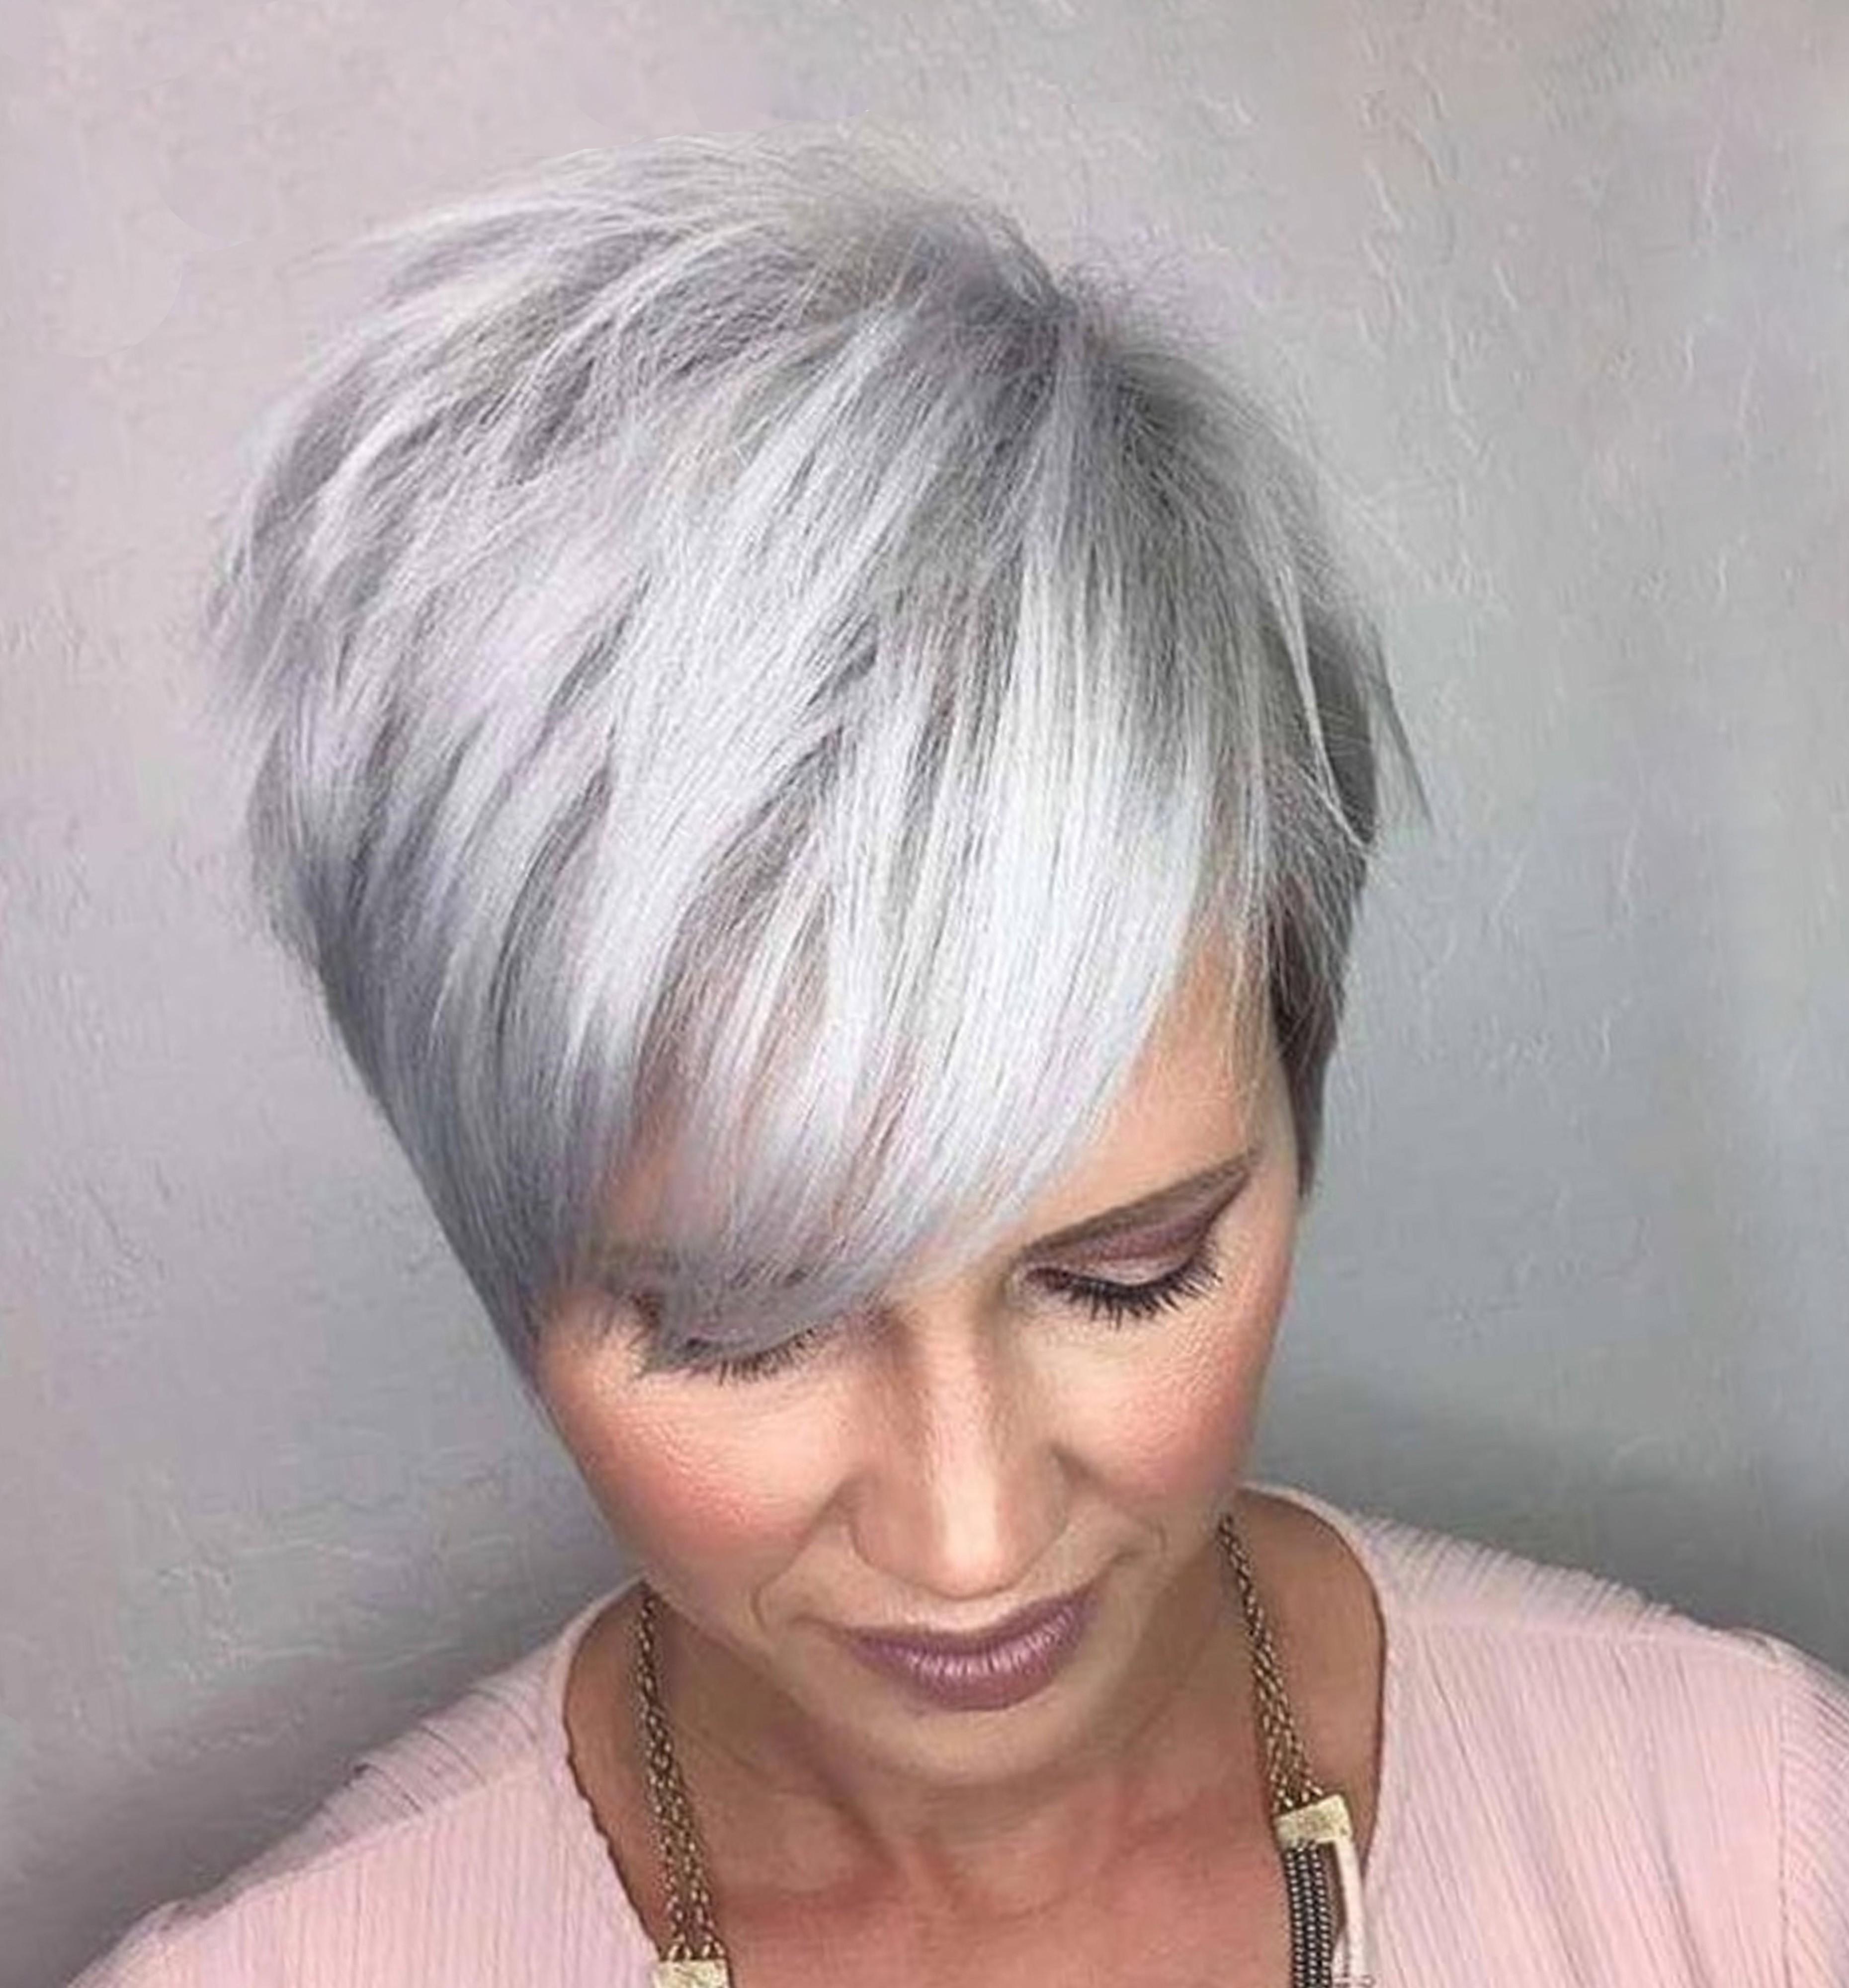 A silver pixie hair style.